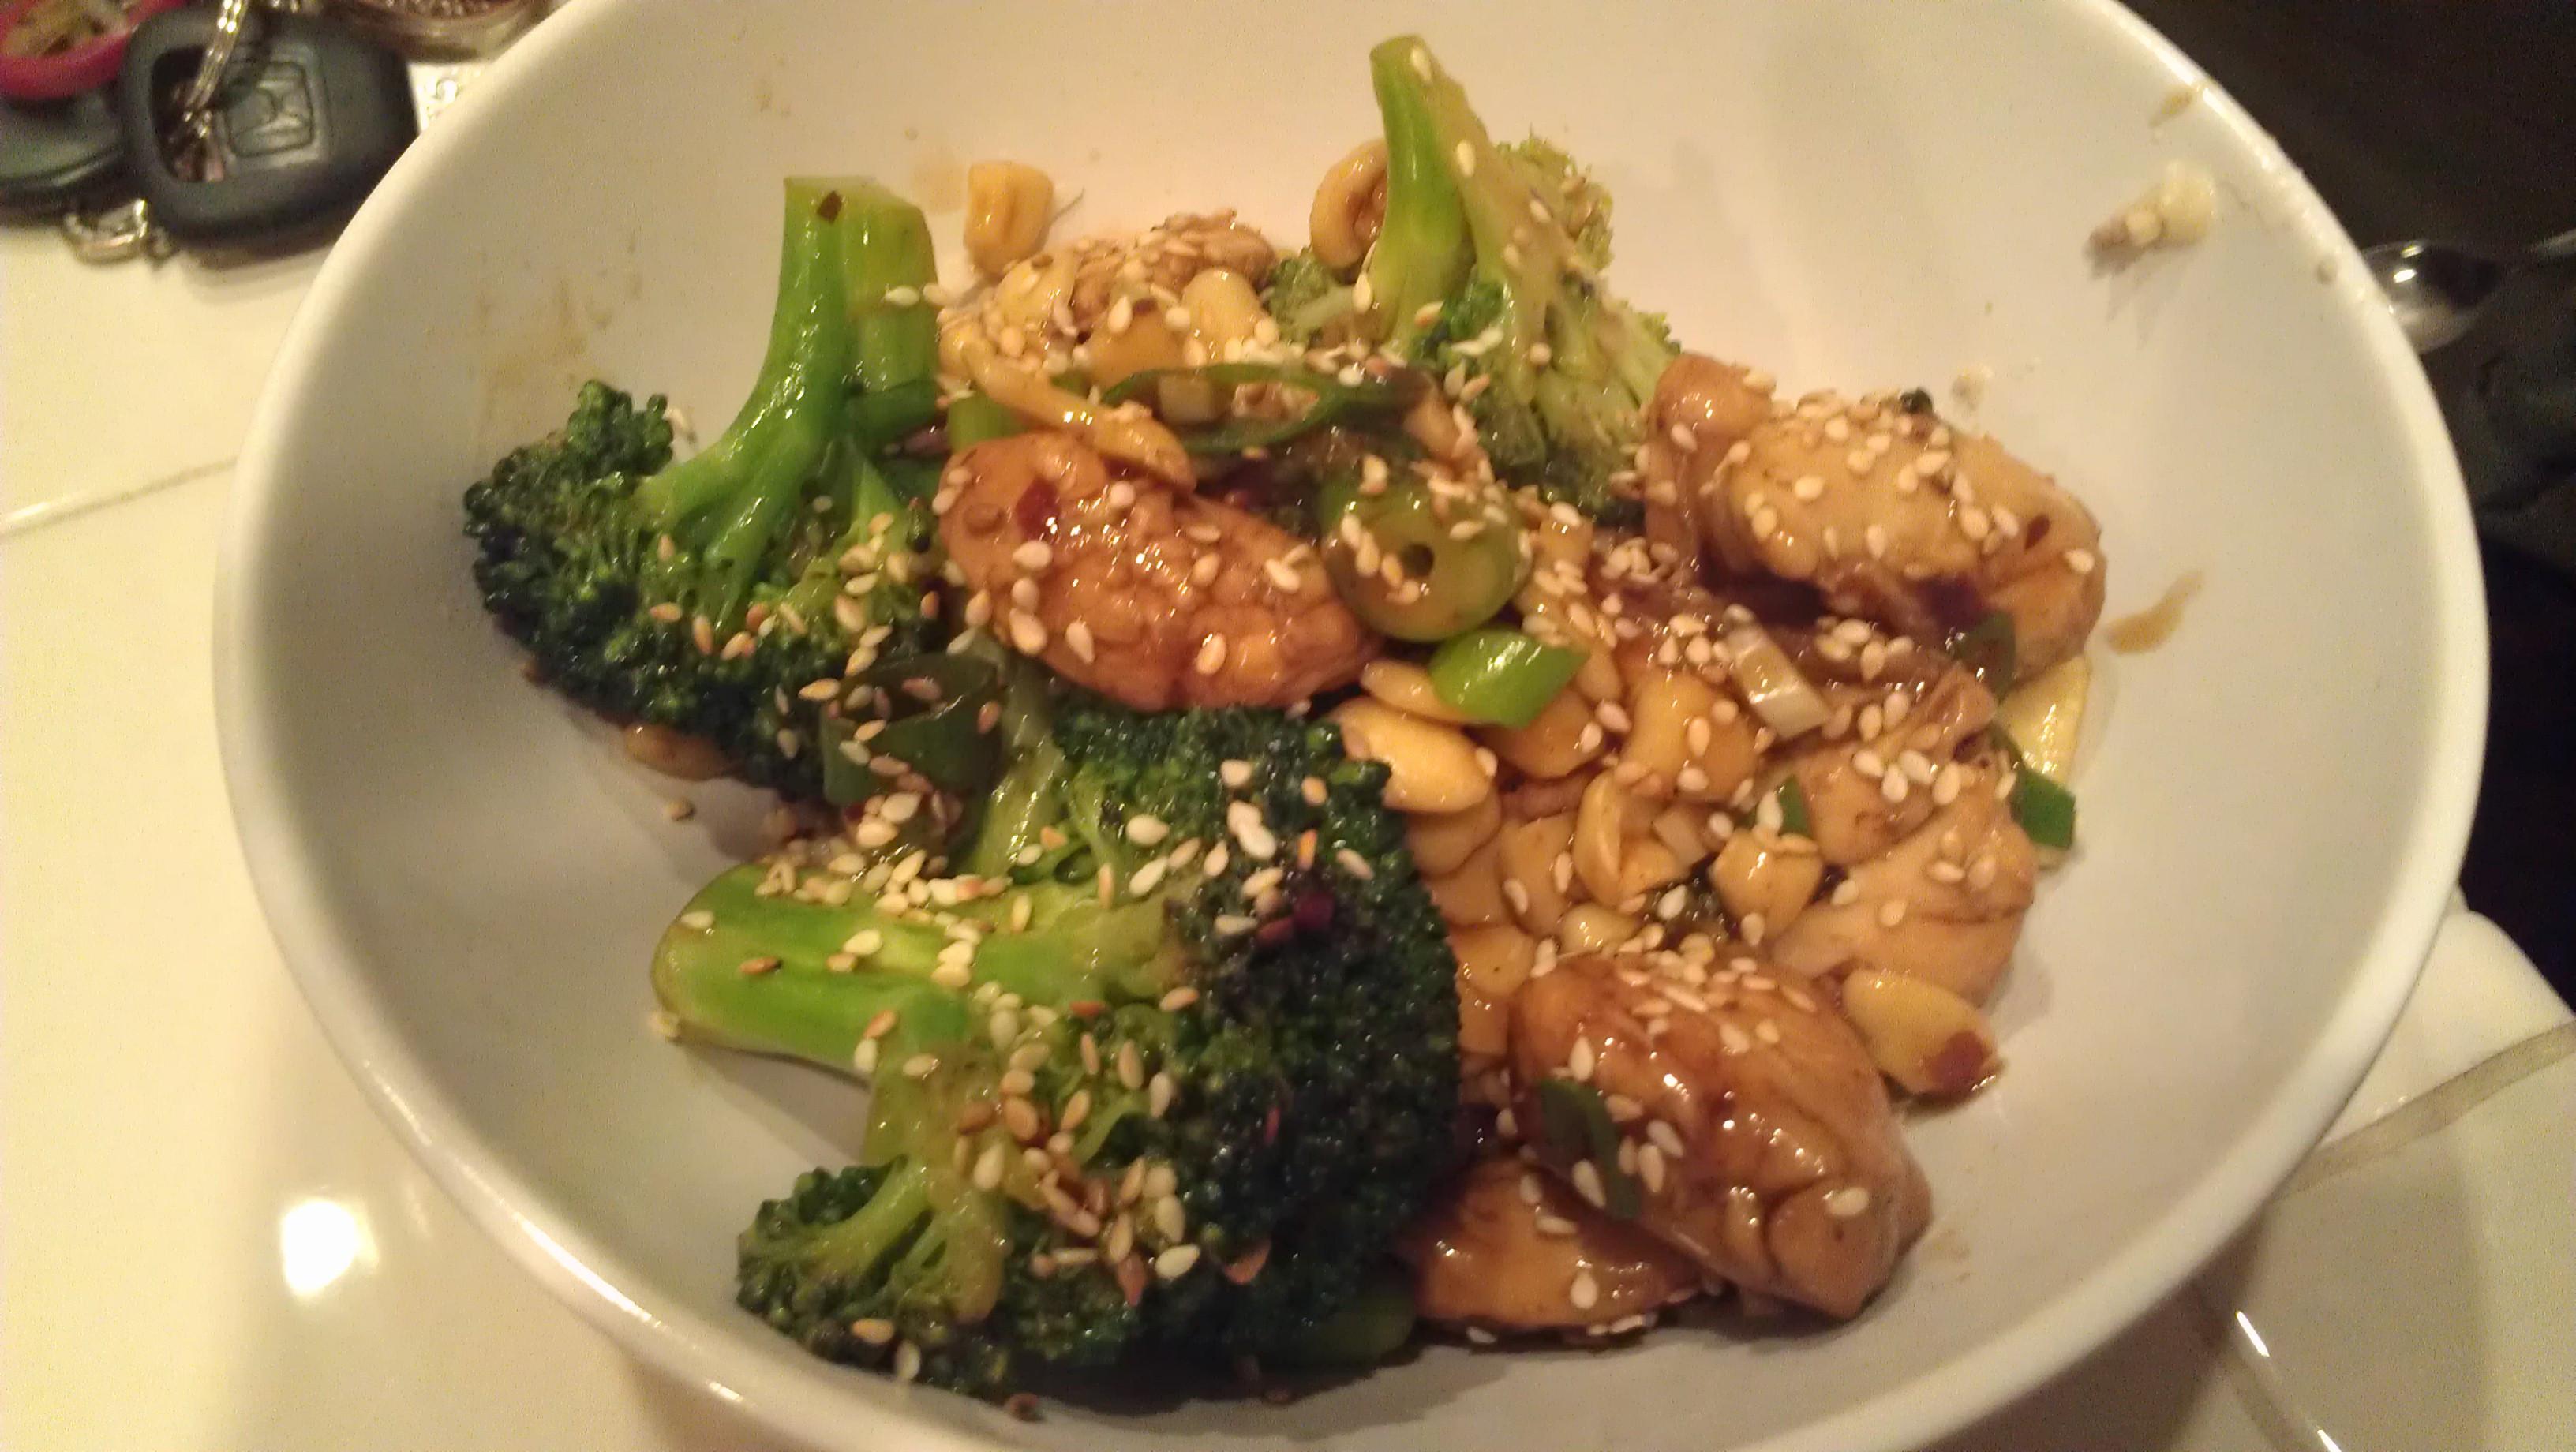 Chicken And Cauliflower Rice  Paleo Cashew Chicken and Broccoli with Coconut Cauliflower